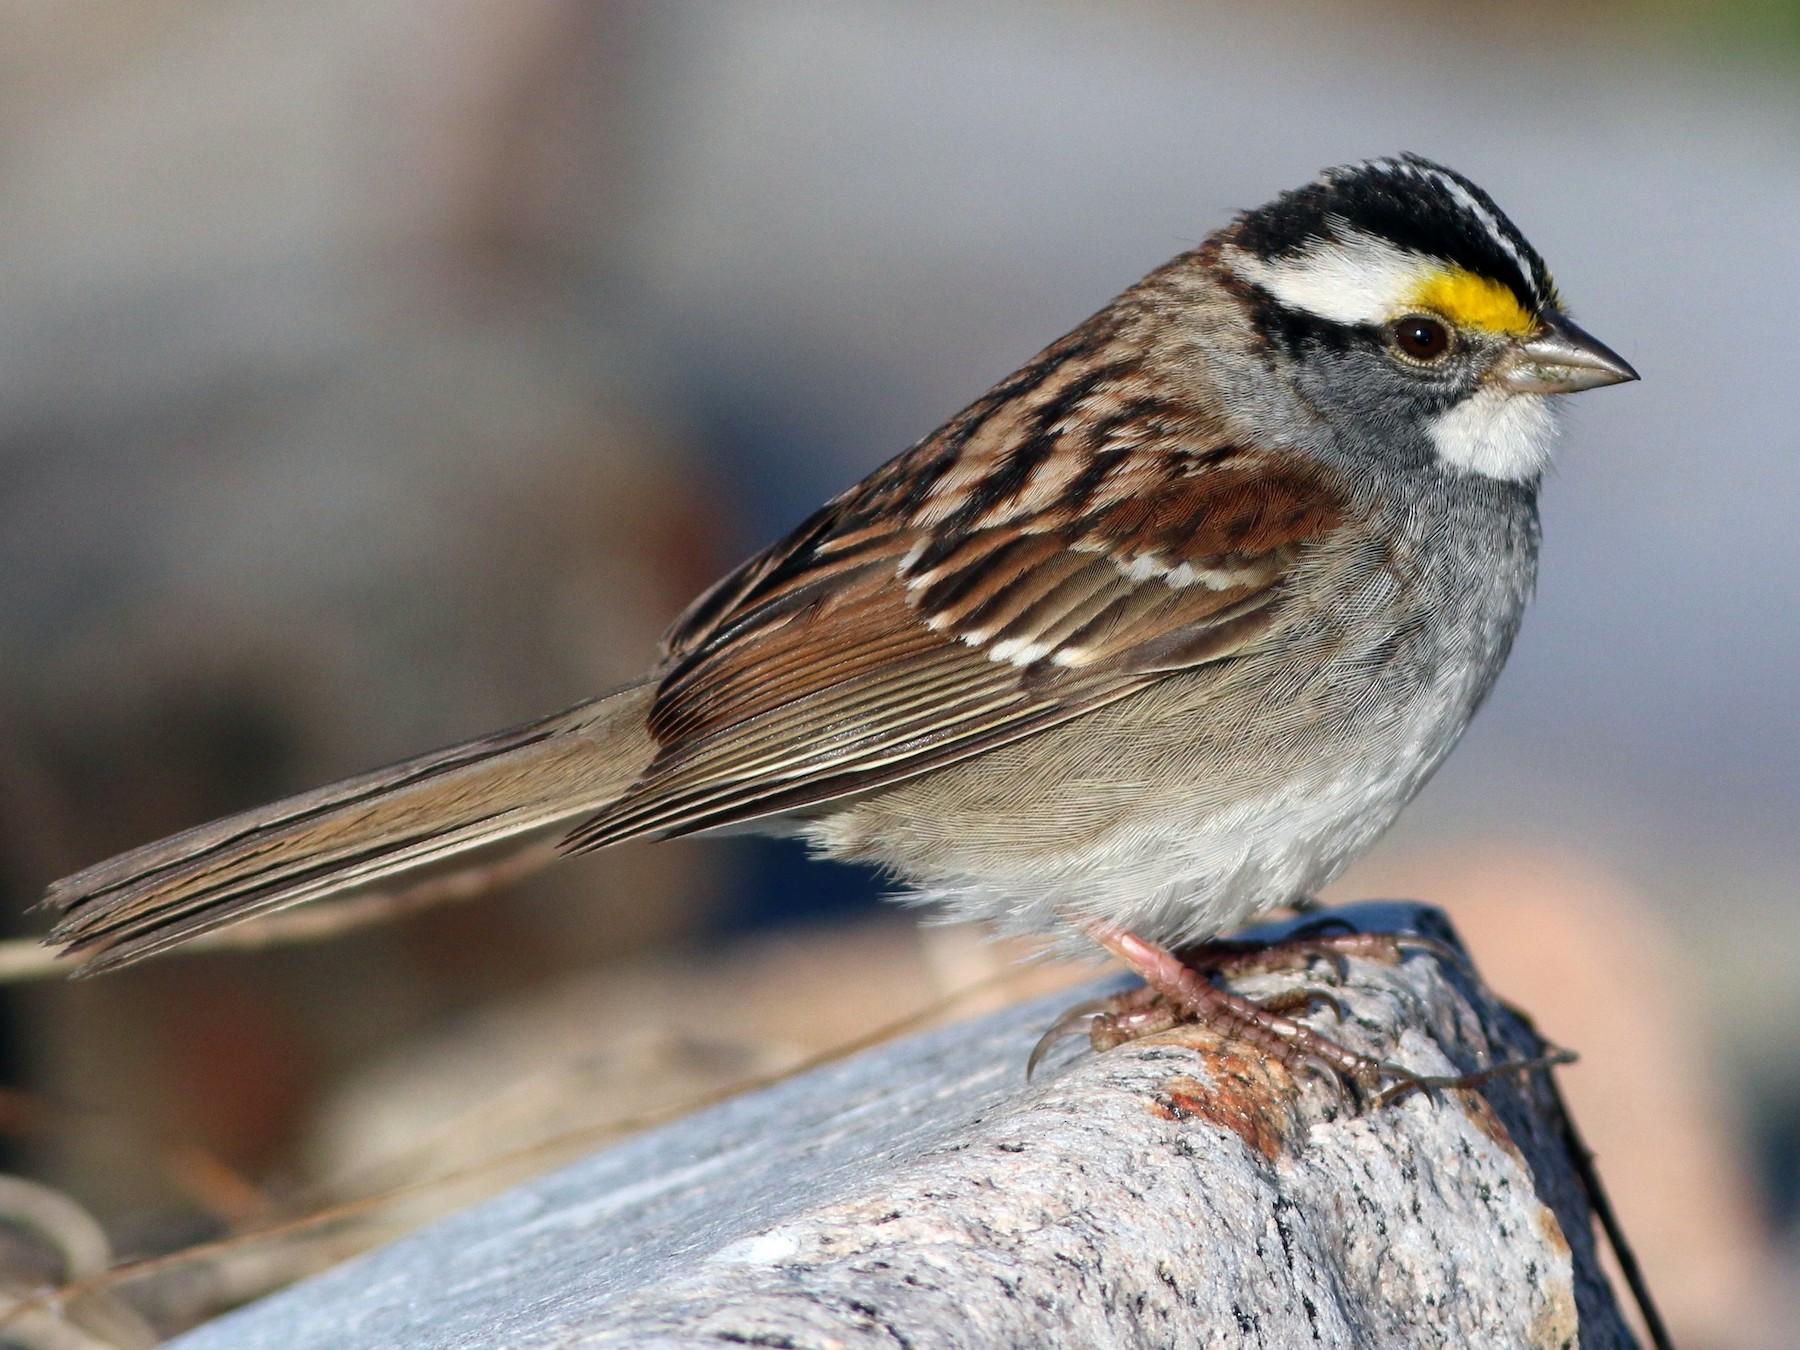 White-throated Sparrow - Keenan Yakola